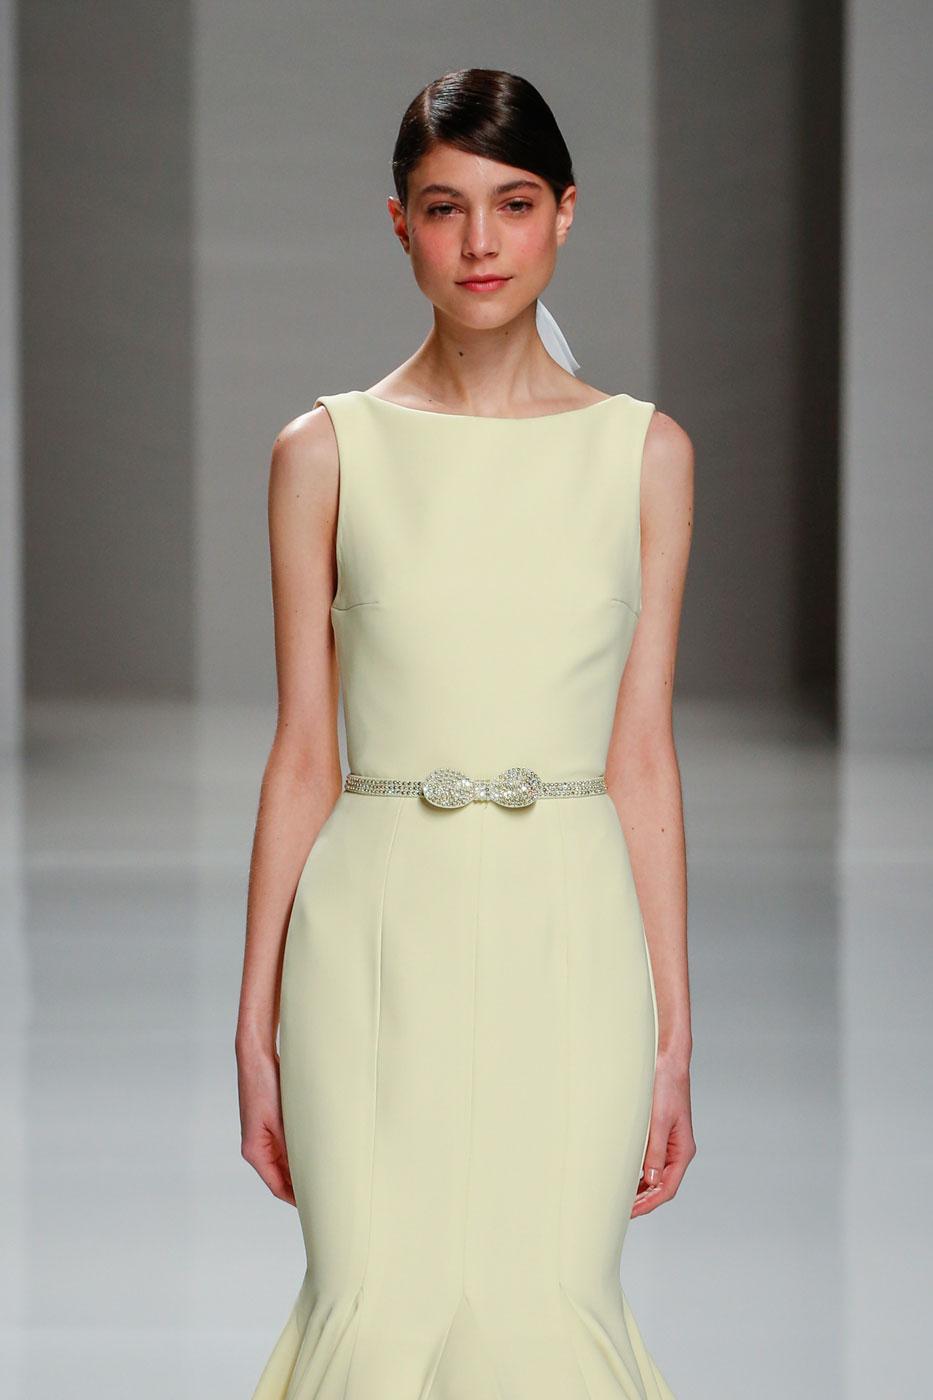 Georges-Hobeika-fashion-runway-show-haute-couture-paris-spring-2015-the-impression-24